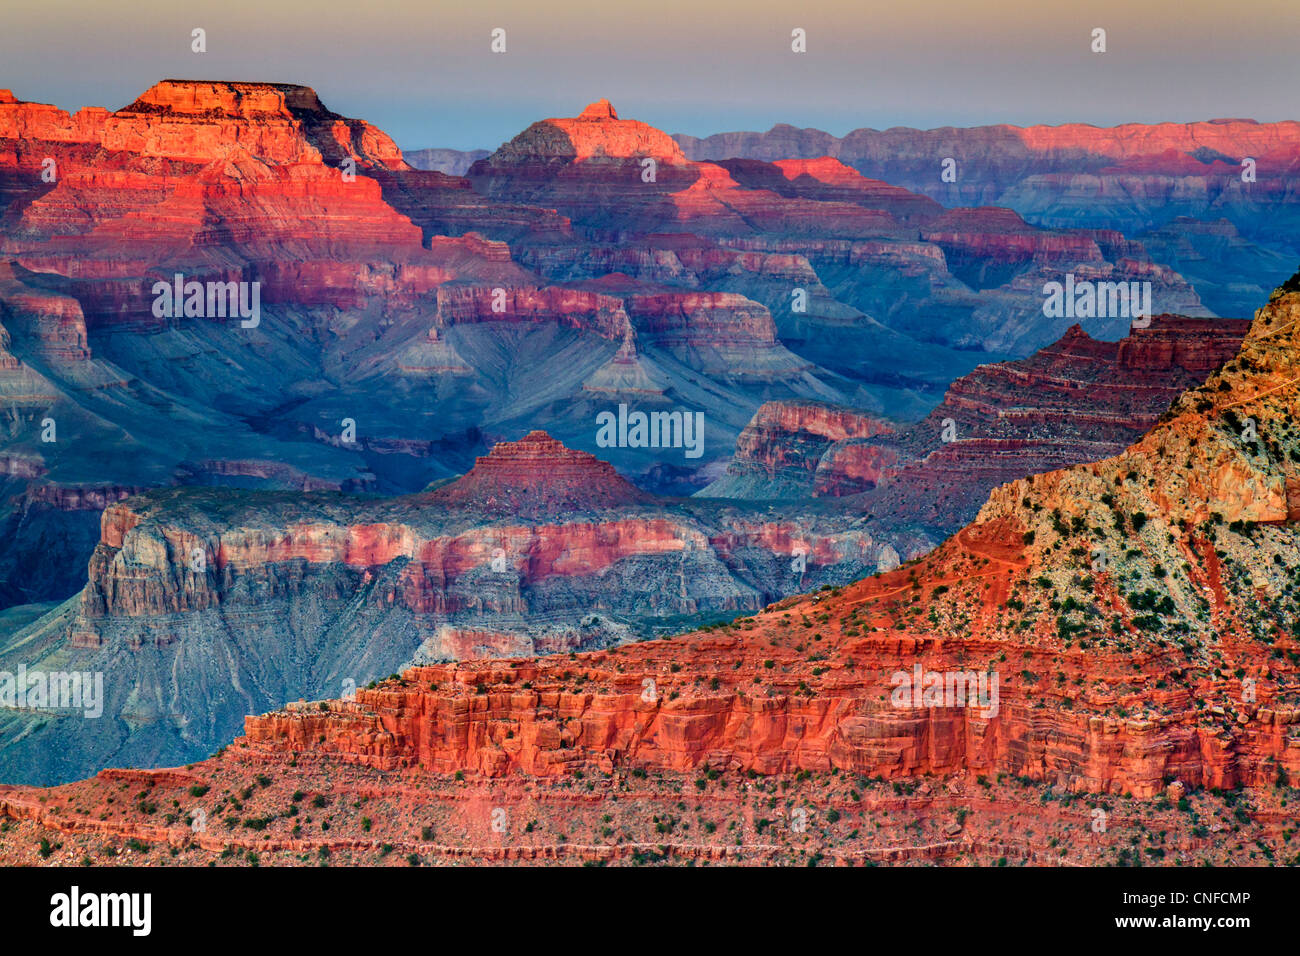 Sonnenuntergang auf Mutter Punkt, South Rim, Grand Canyon National Park (Arizona, USA). HDR-Technik. Stockbild